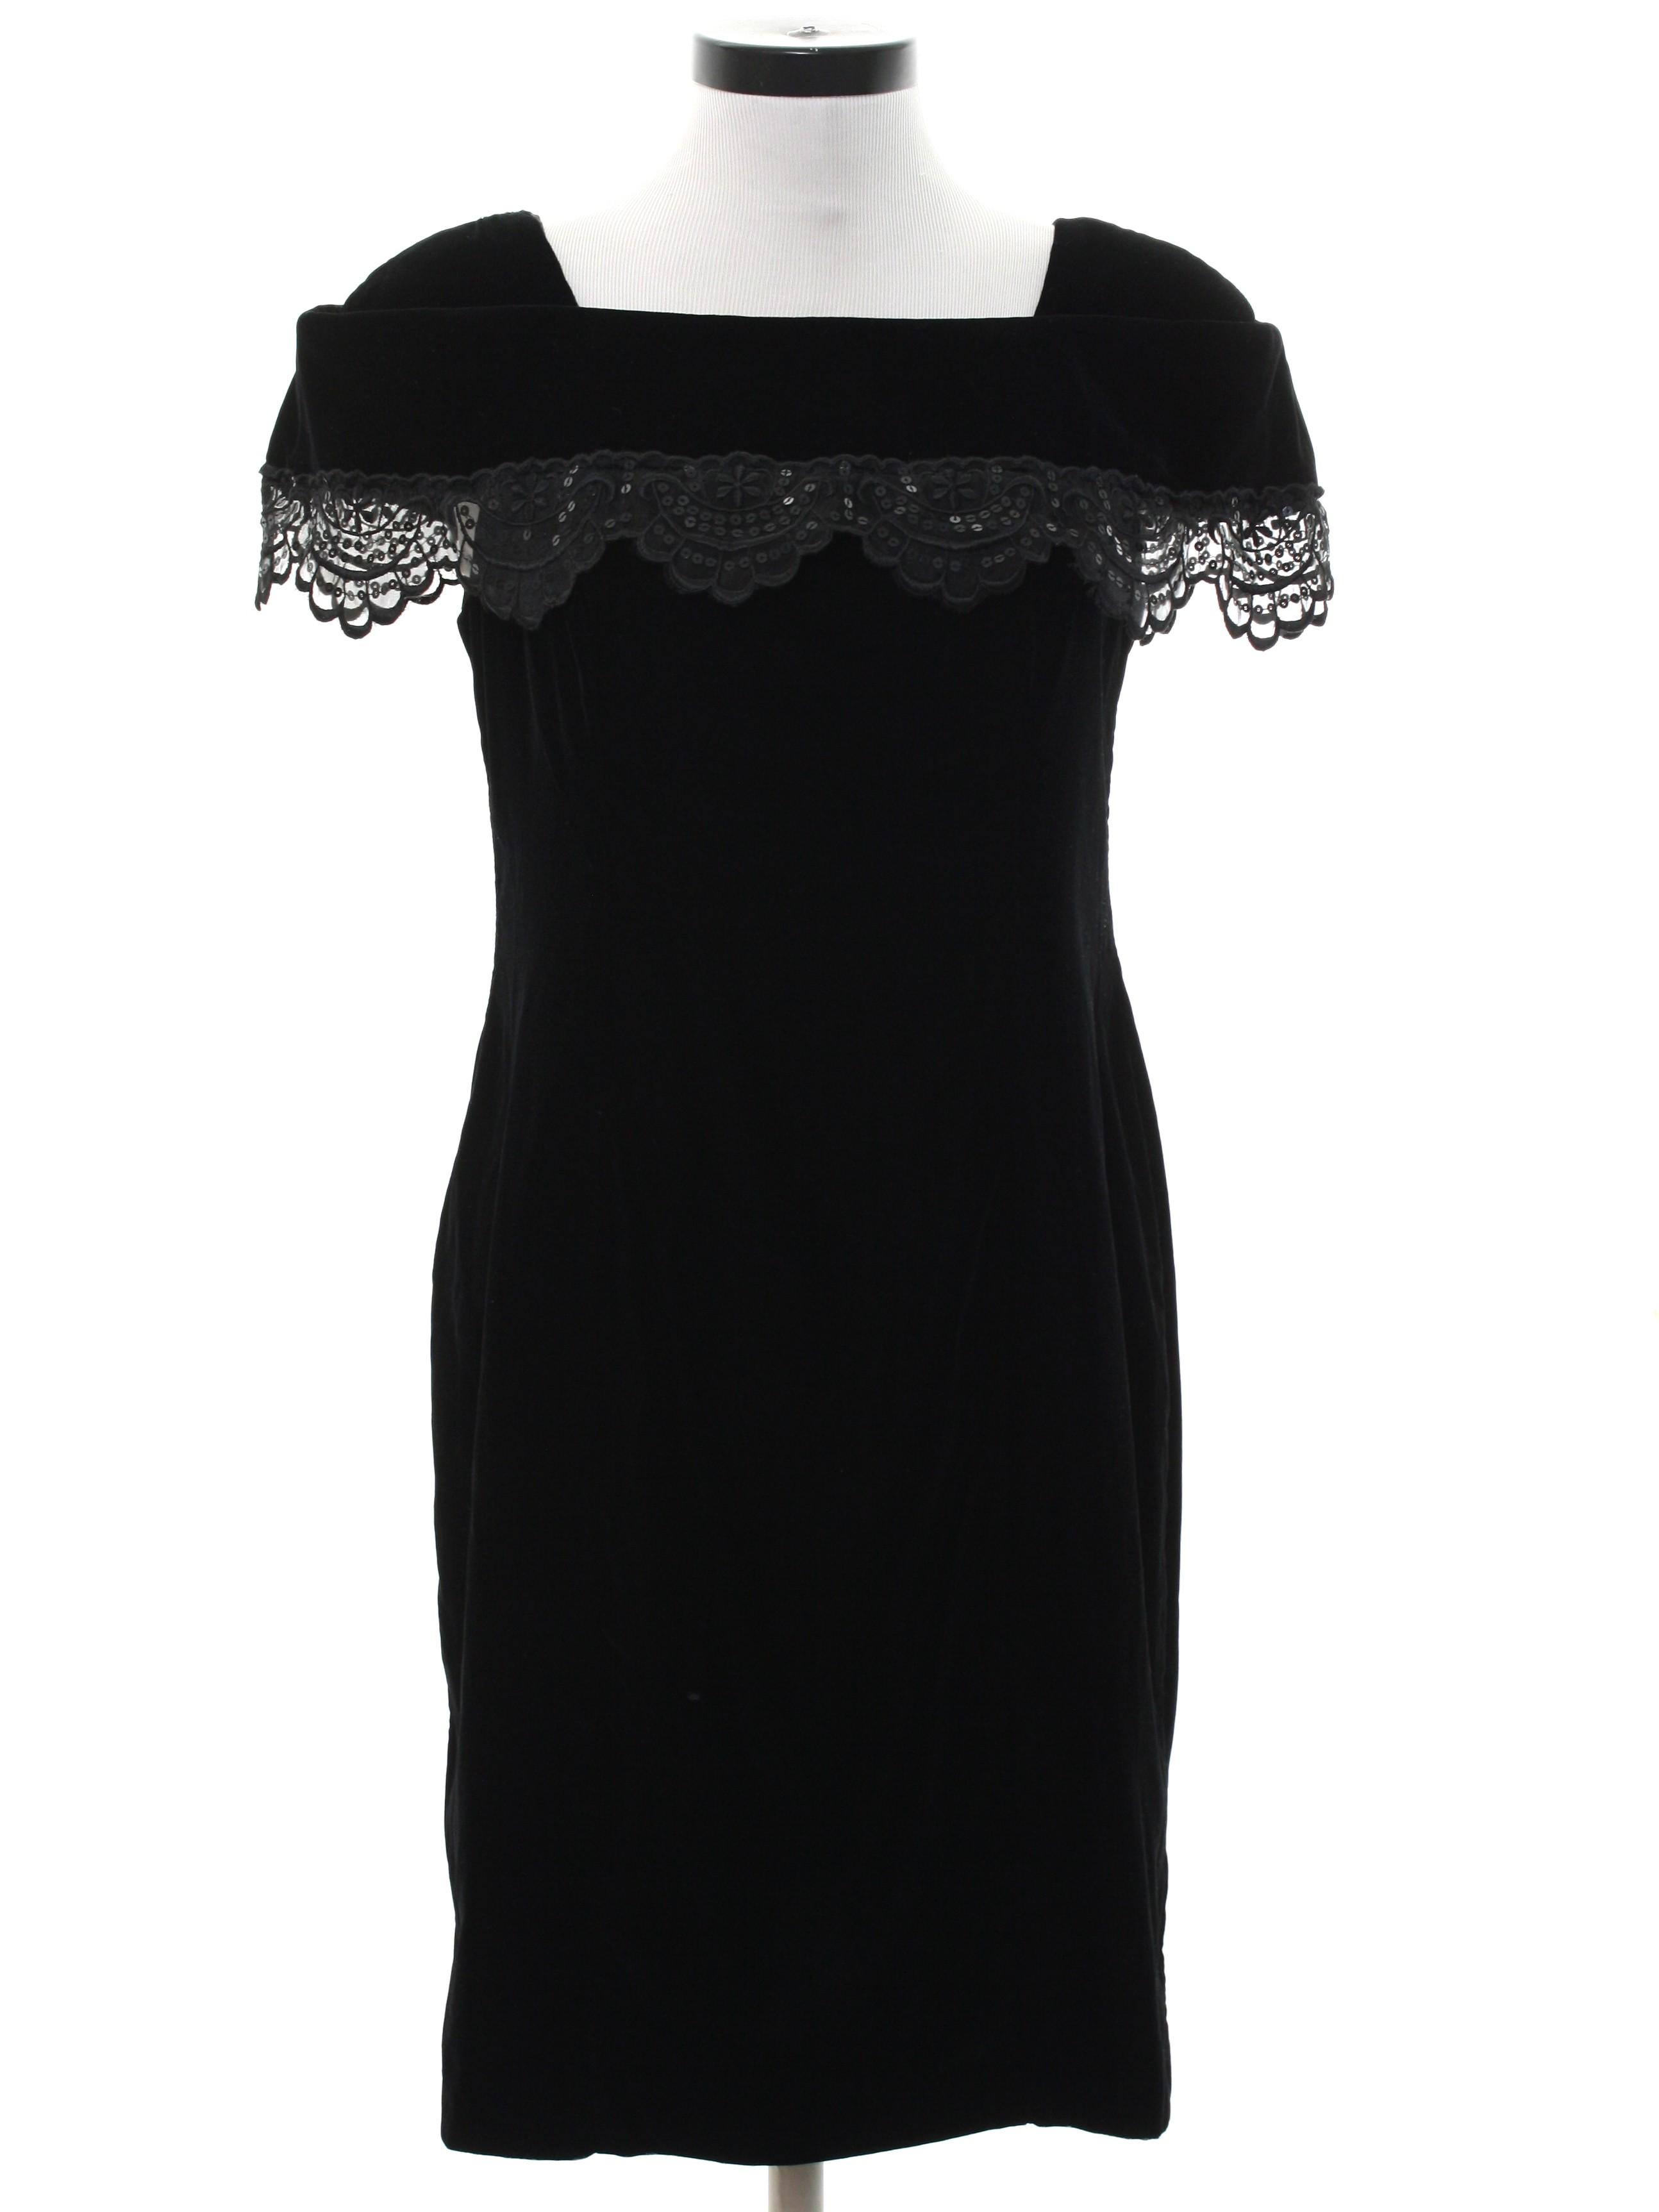 7e9ff7c64df7 Vintage 80s Cocktail Dress  Late 80s -Jessica Howard- Womens black ...